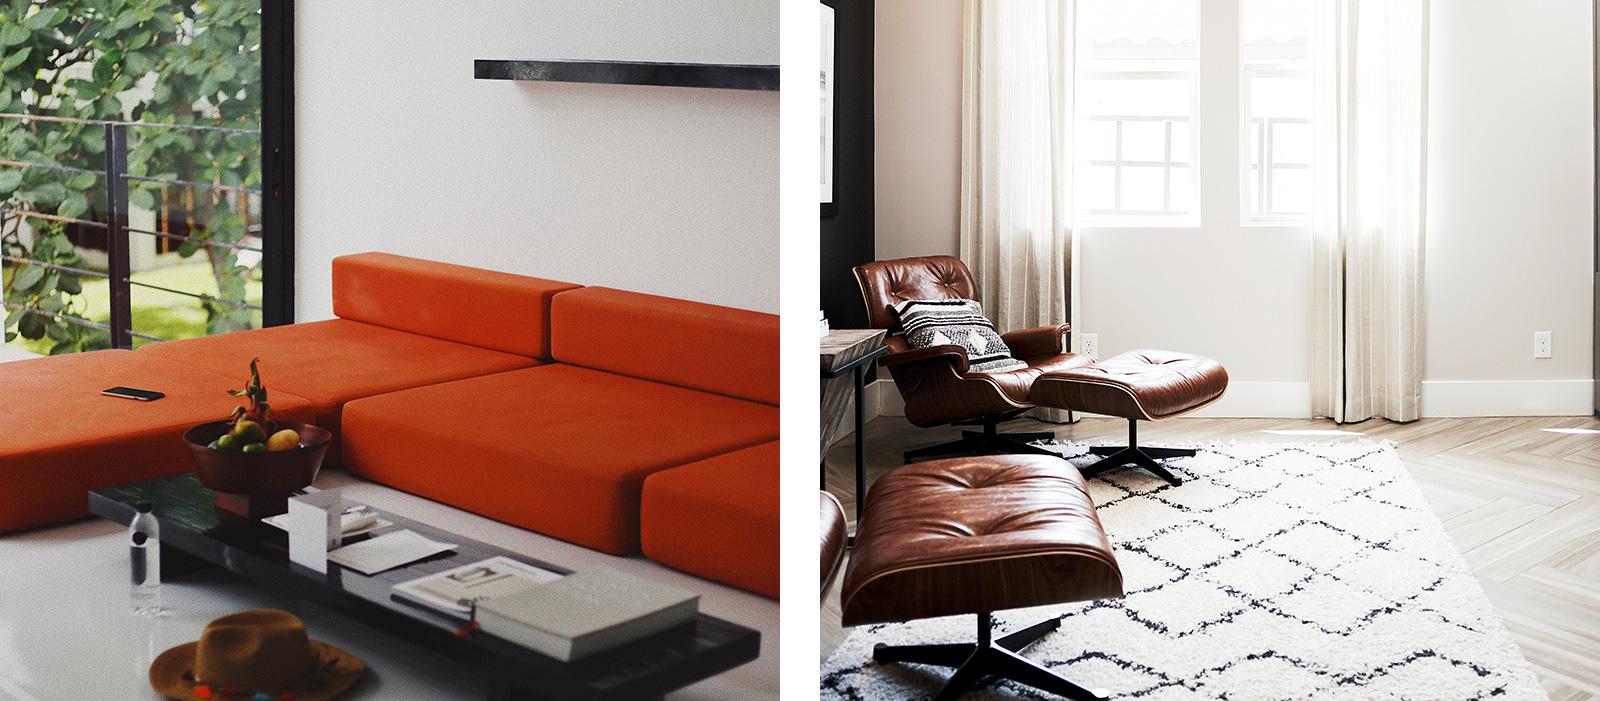 Links: Minimalistische Sofalandschaft. Rechts: Design-Klasiker von Charles Eames